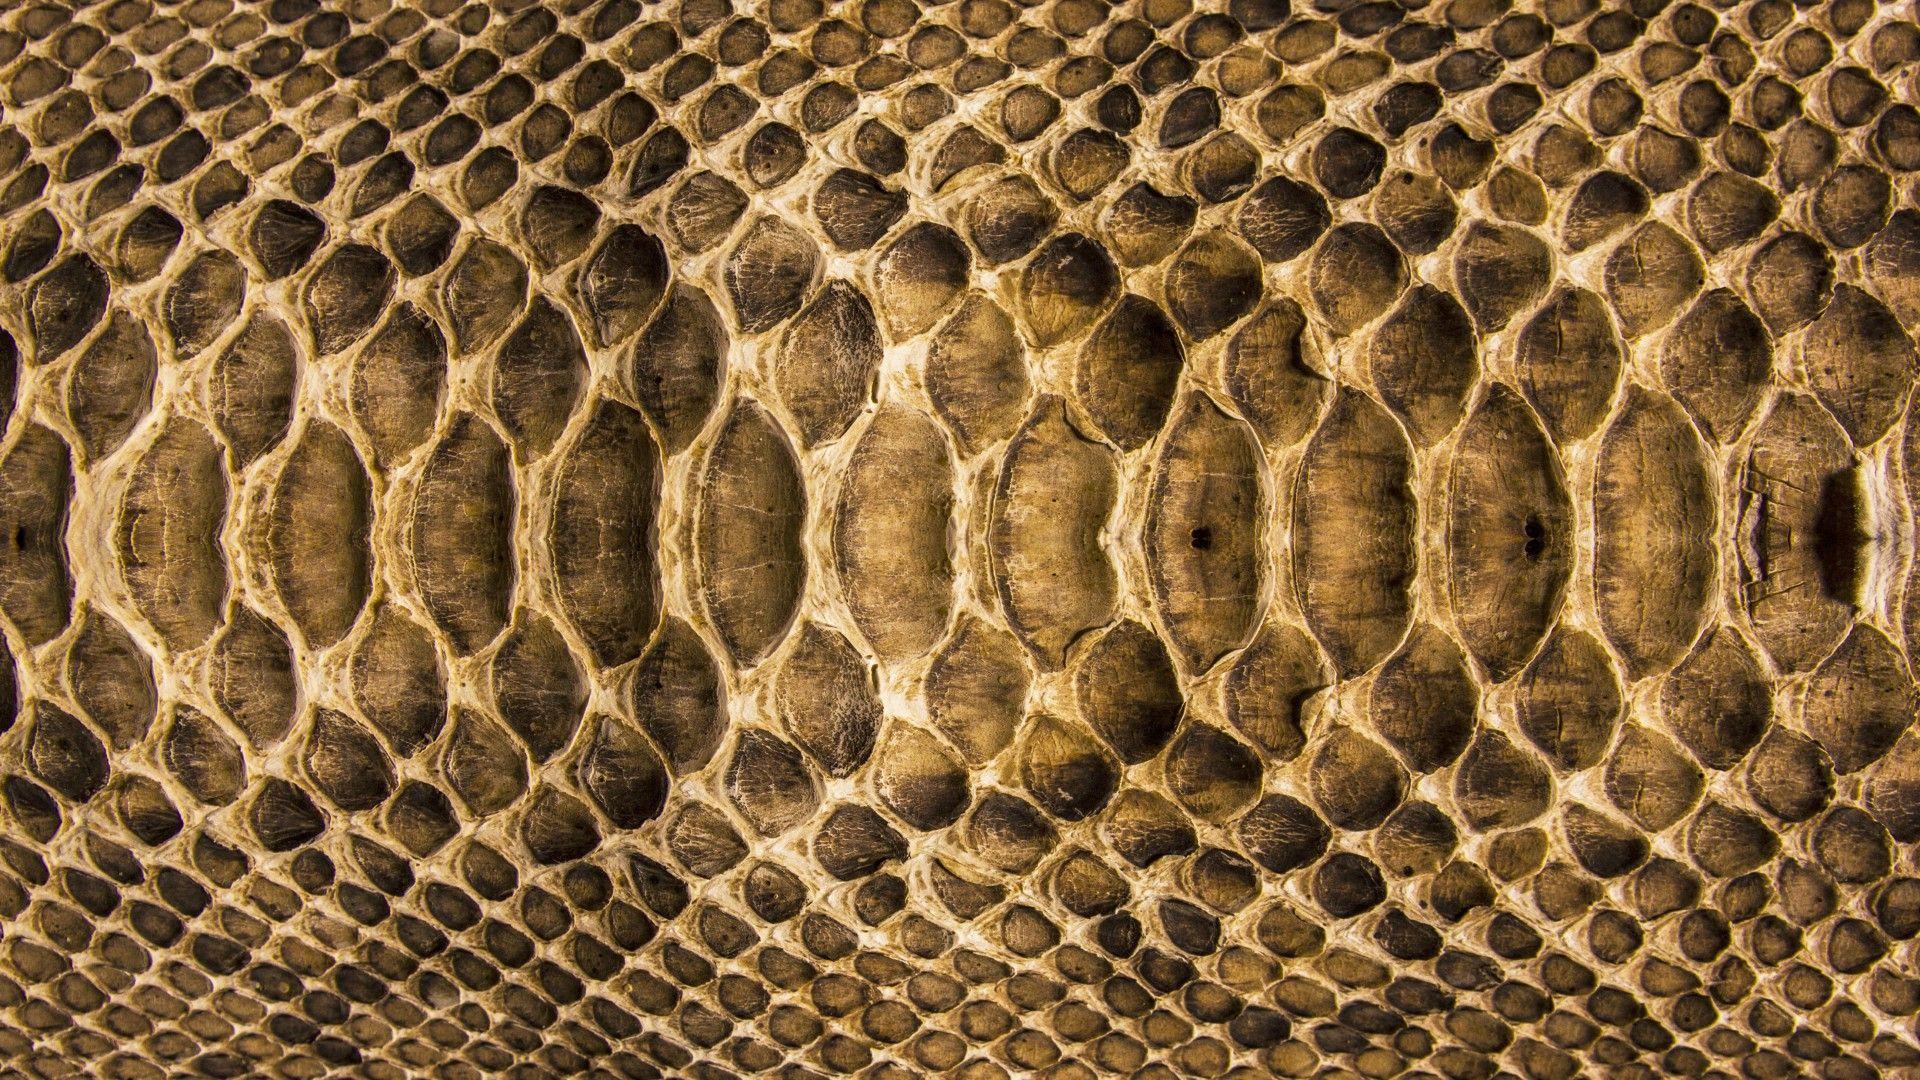 Snake Skin Wallpapers Find Best Latest Snake Skin